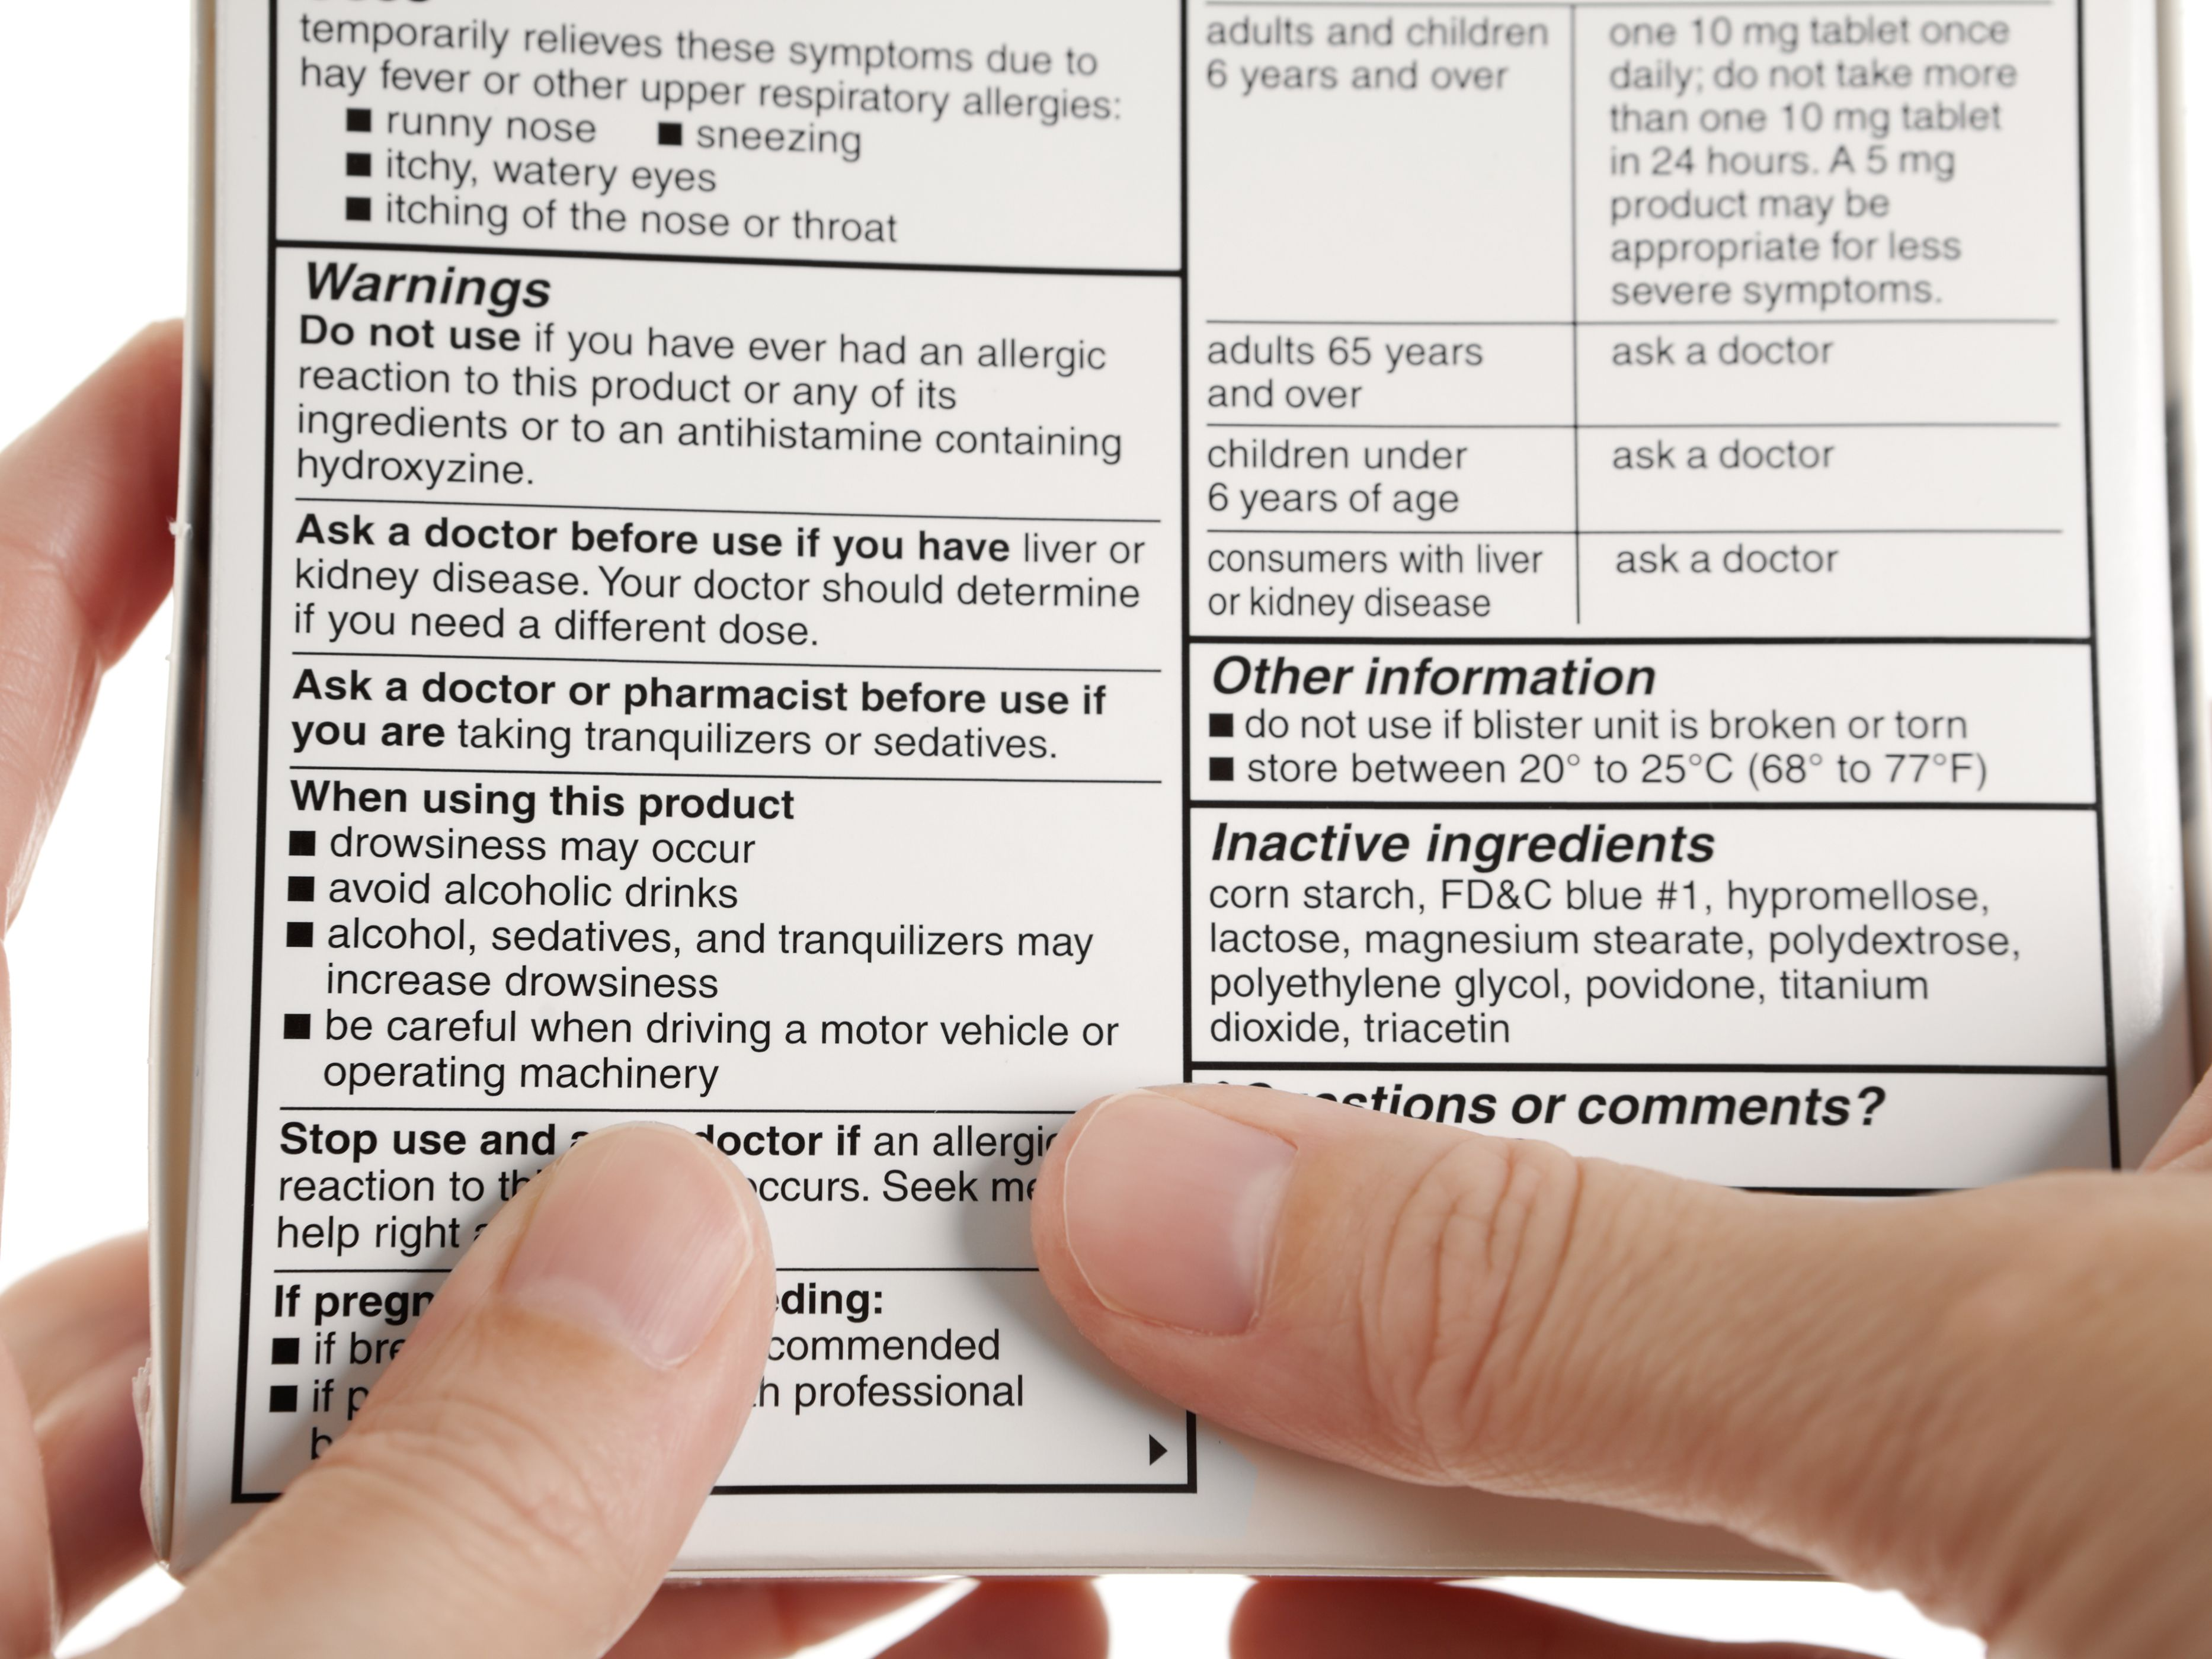 Allegra Over-The-Counter Drug Information